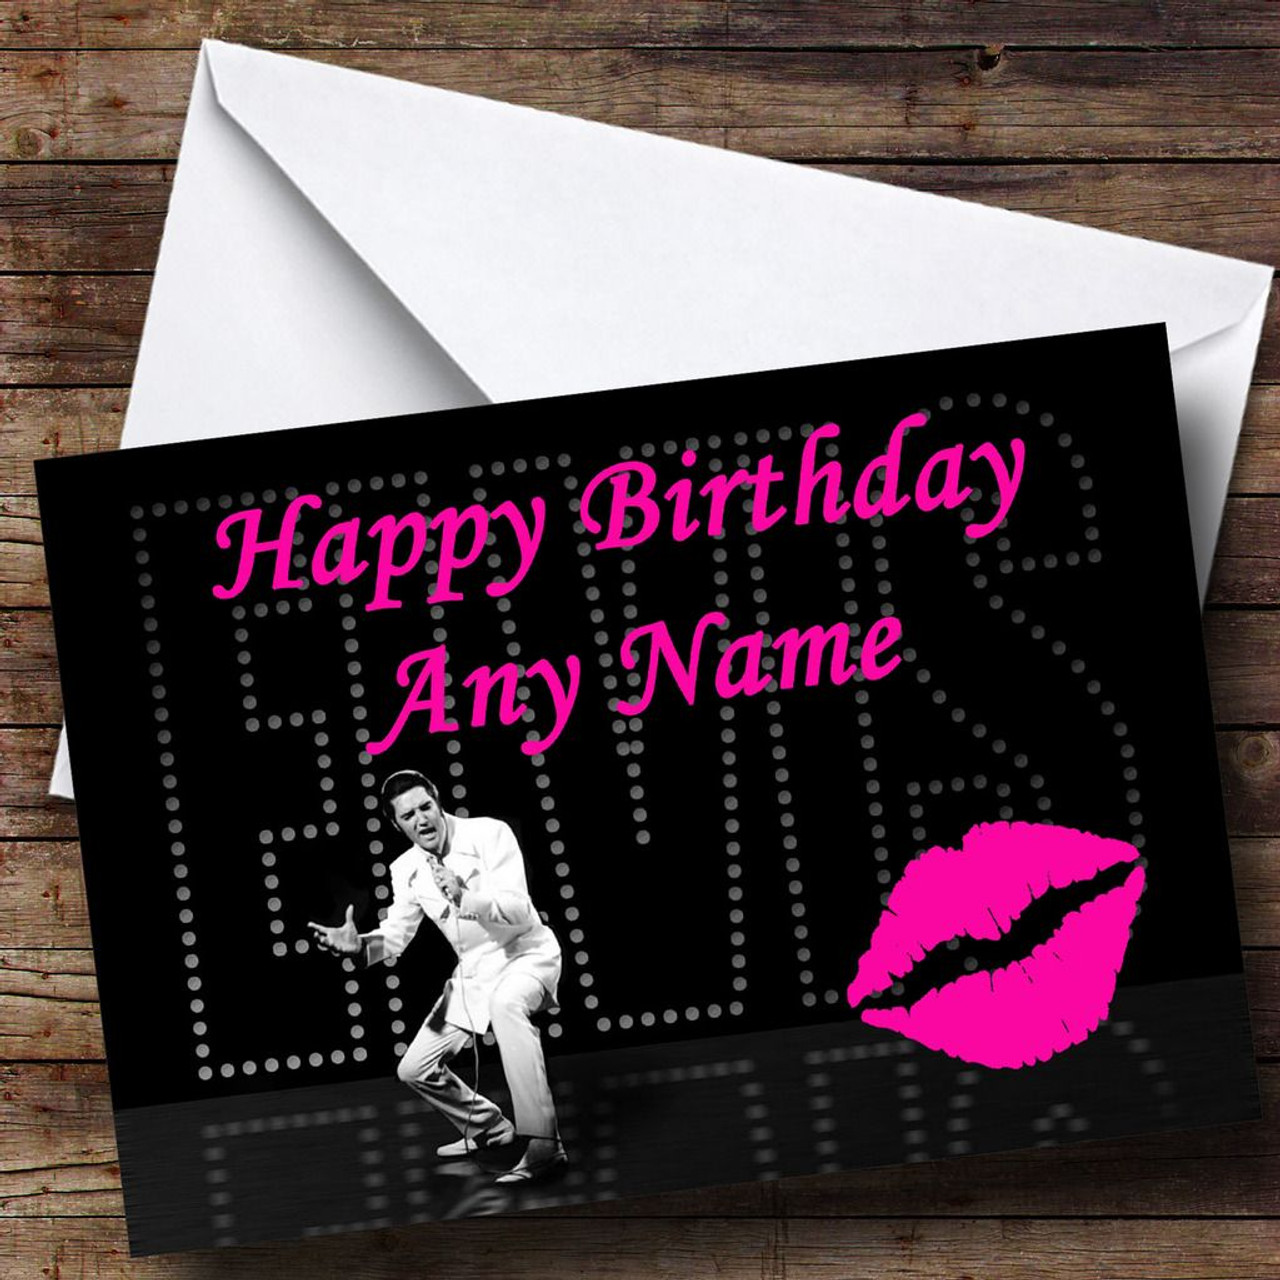 Elvis presley personalised birthday card the card zoo elvis presley personalised birthday card kristyandbryce Images